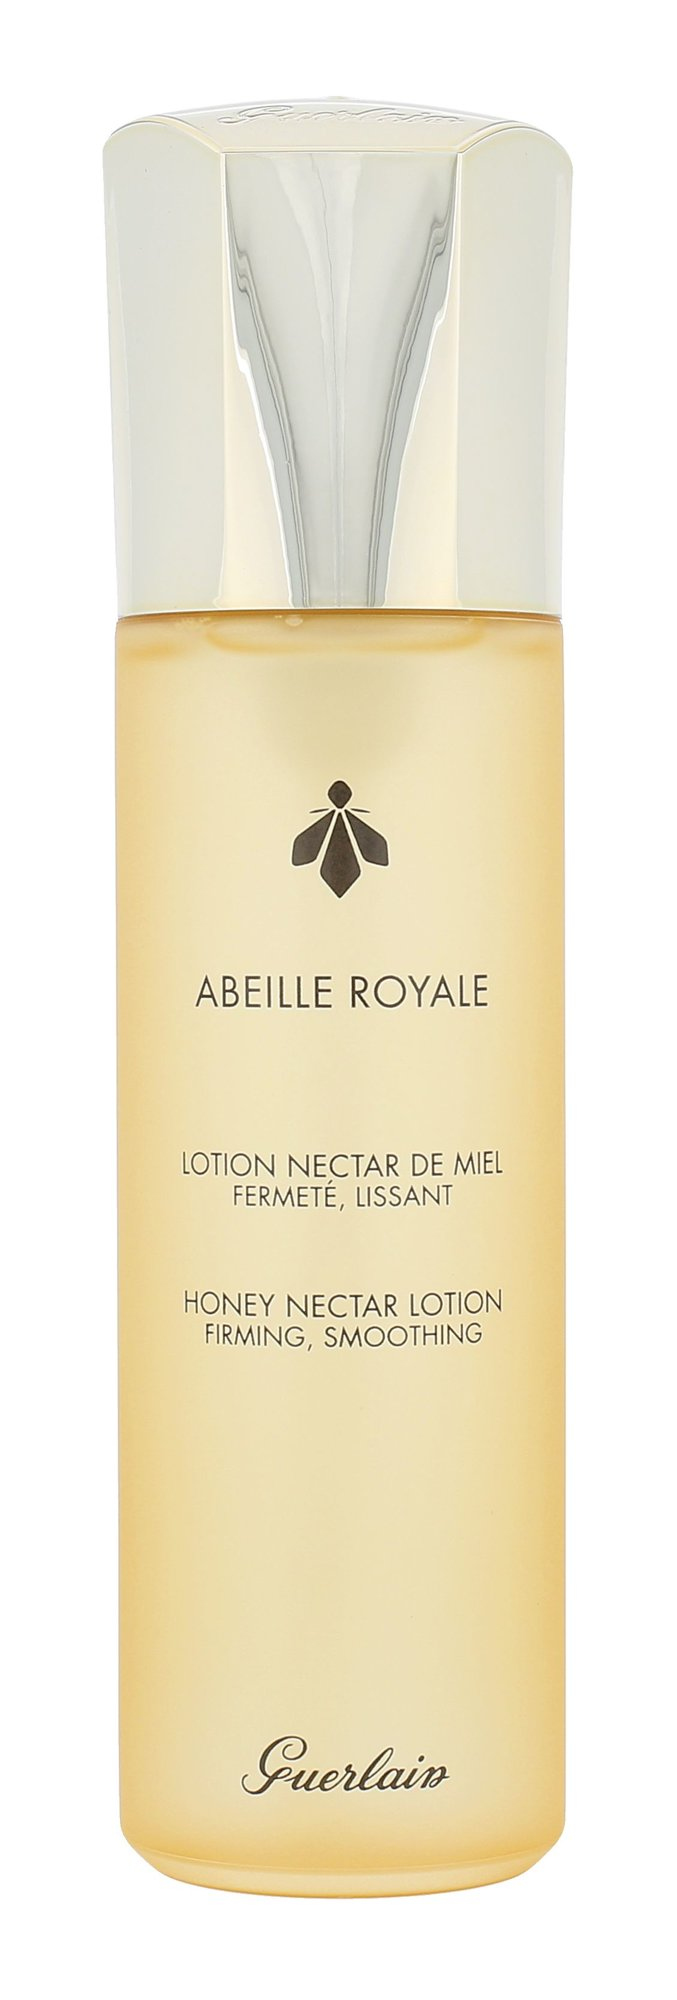 Guerlain Abeille Royale Cosmetic 150ml